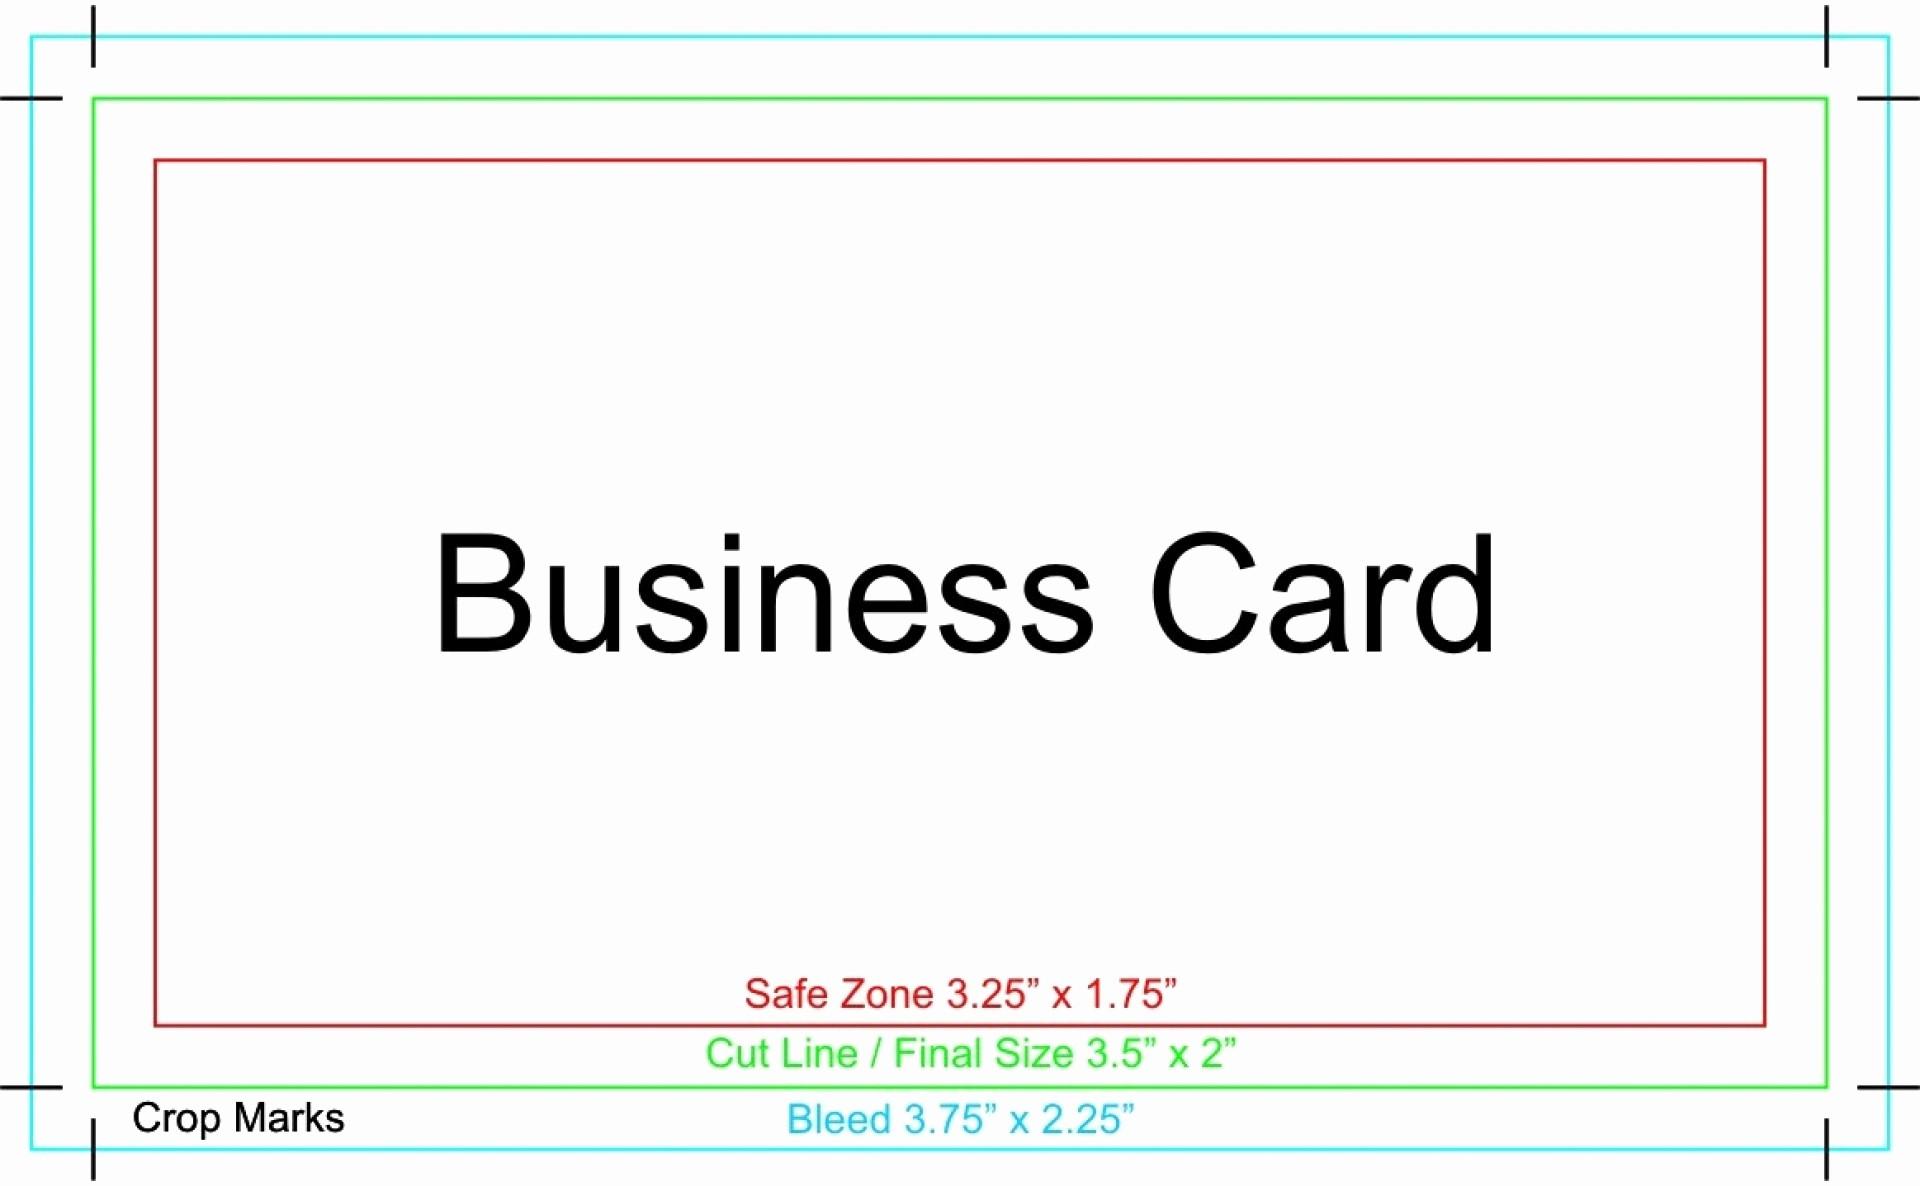 Microsoft Business Card Templates Free Unique 022 Microsoft Word Business Card Template with Crop Marks